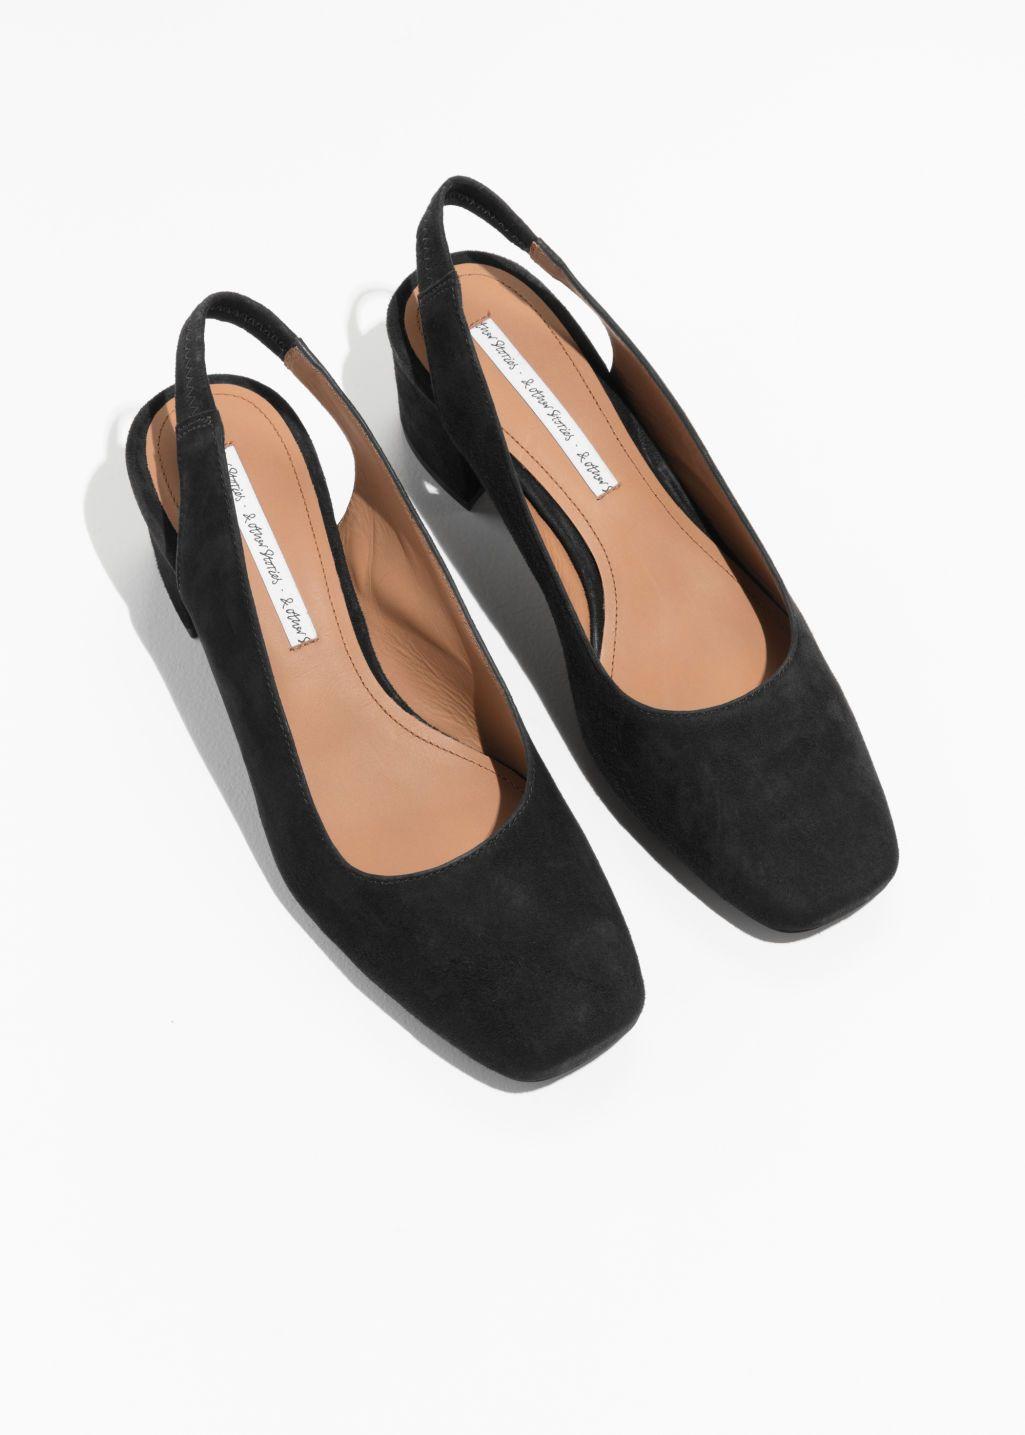 3f4aedaeaba Suede Slingback Ballet Pumps - Black - Pumps -   Other Stories